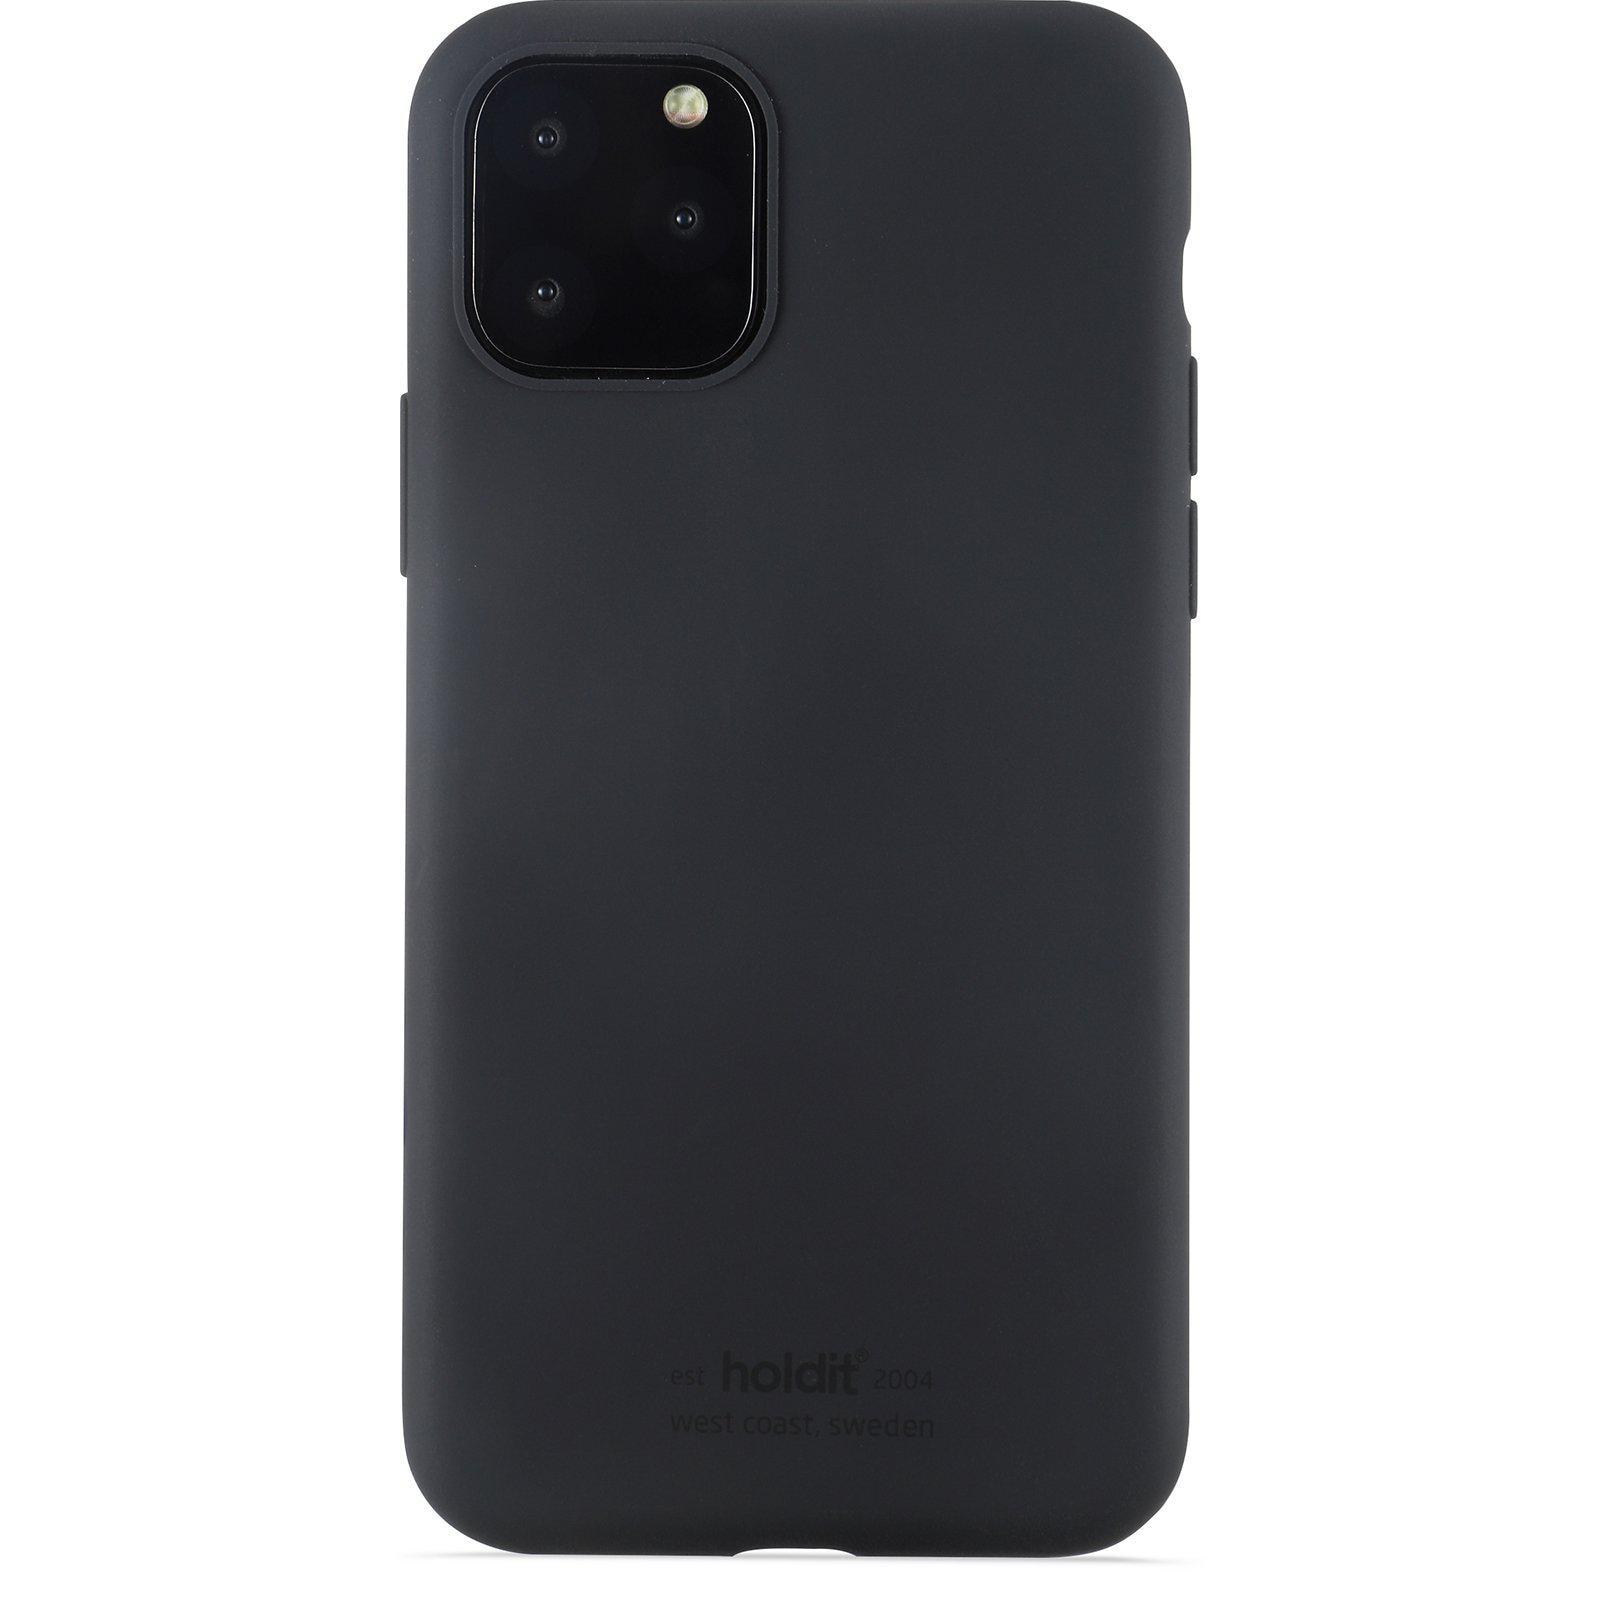 Silikonikuori iPhone 11 Pro/XS/X Musta